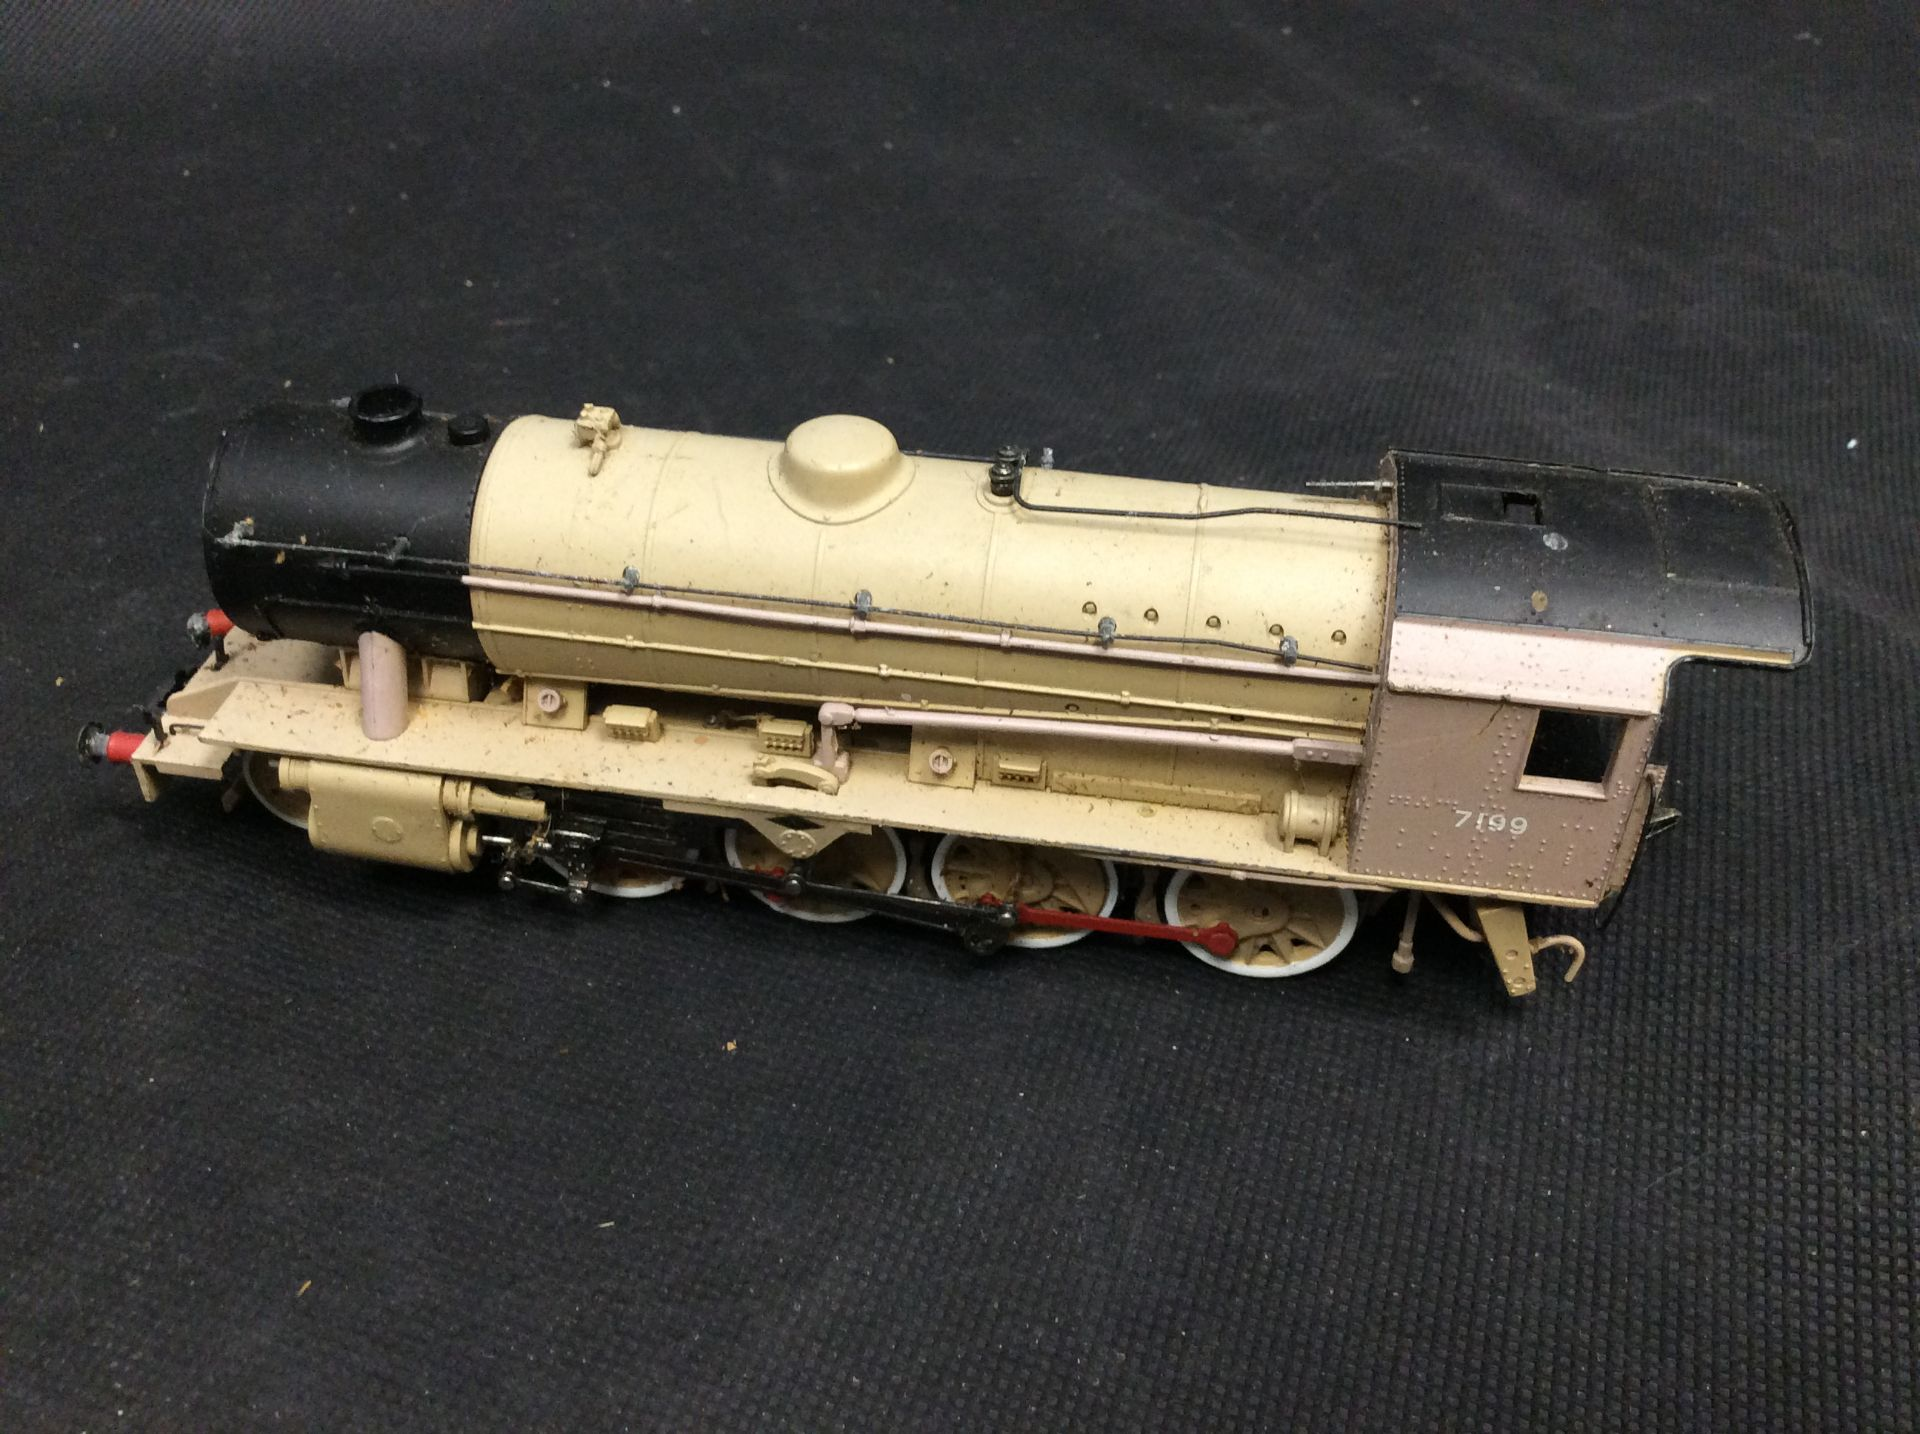 Rare bachmann 7199 loco - Image 2 of 3